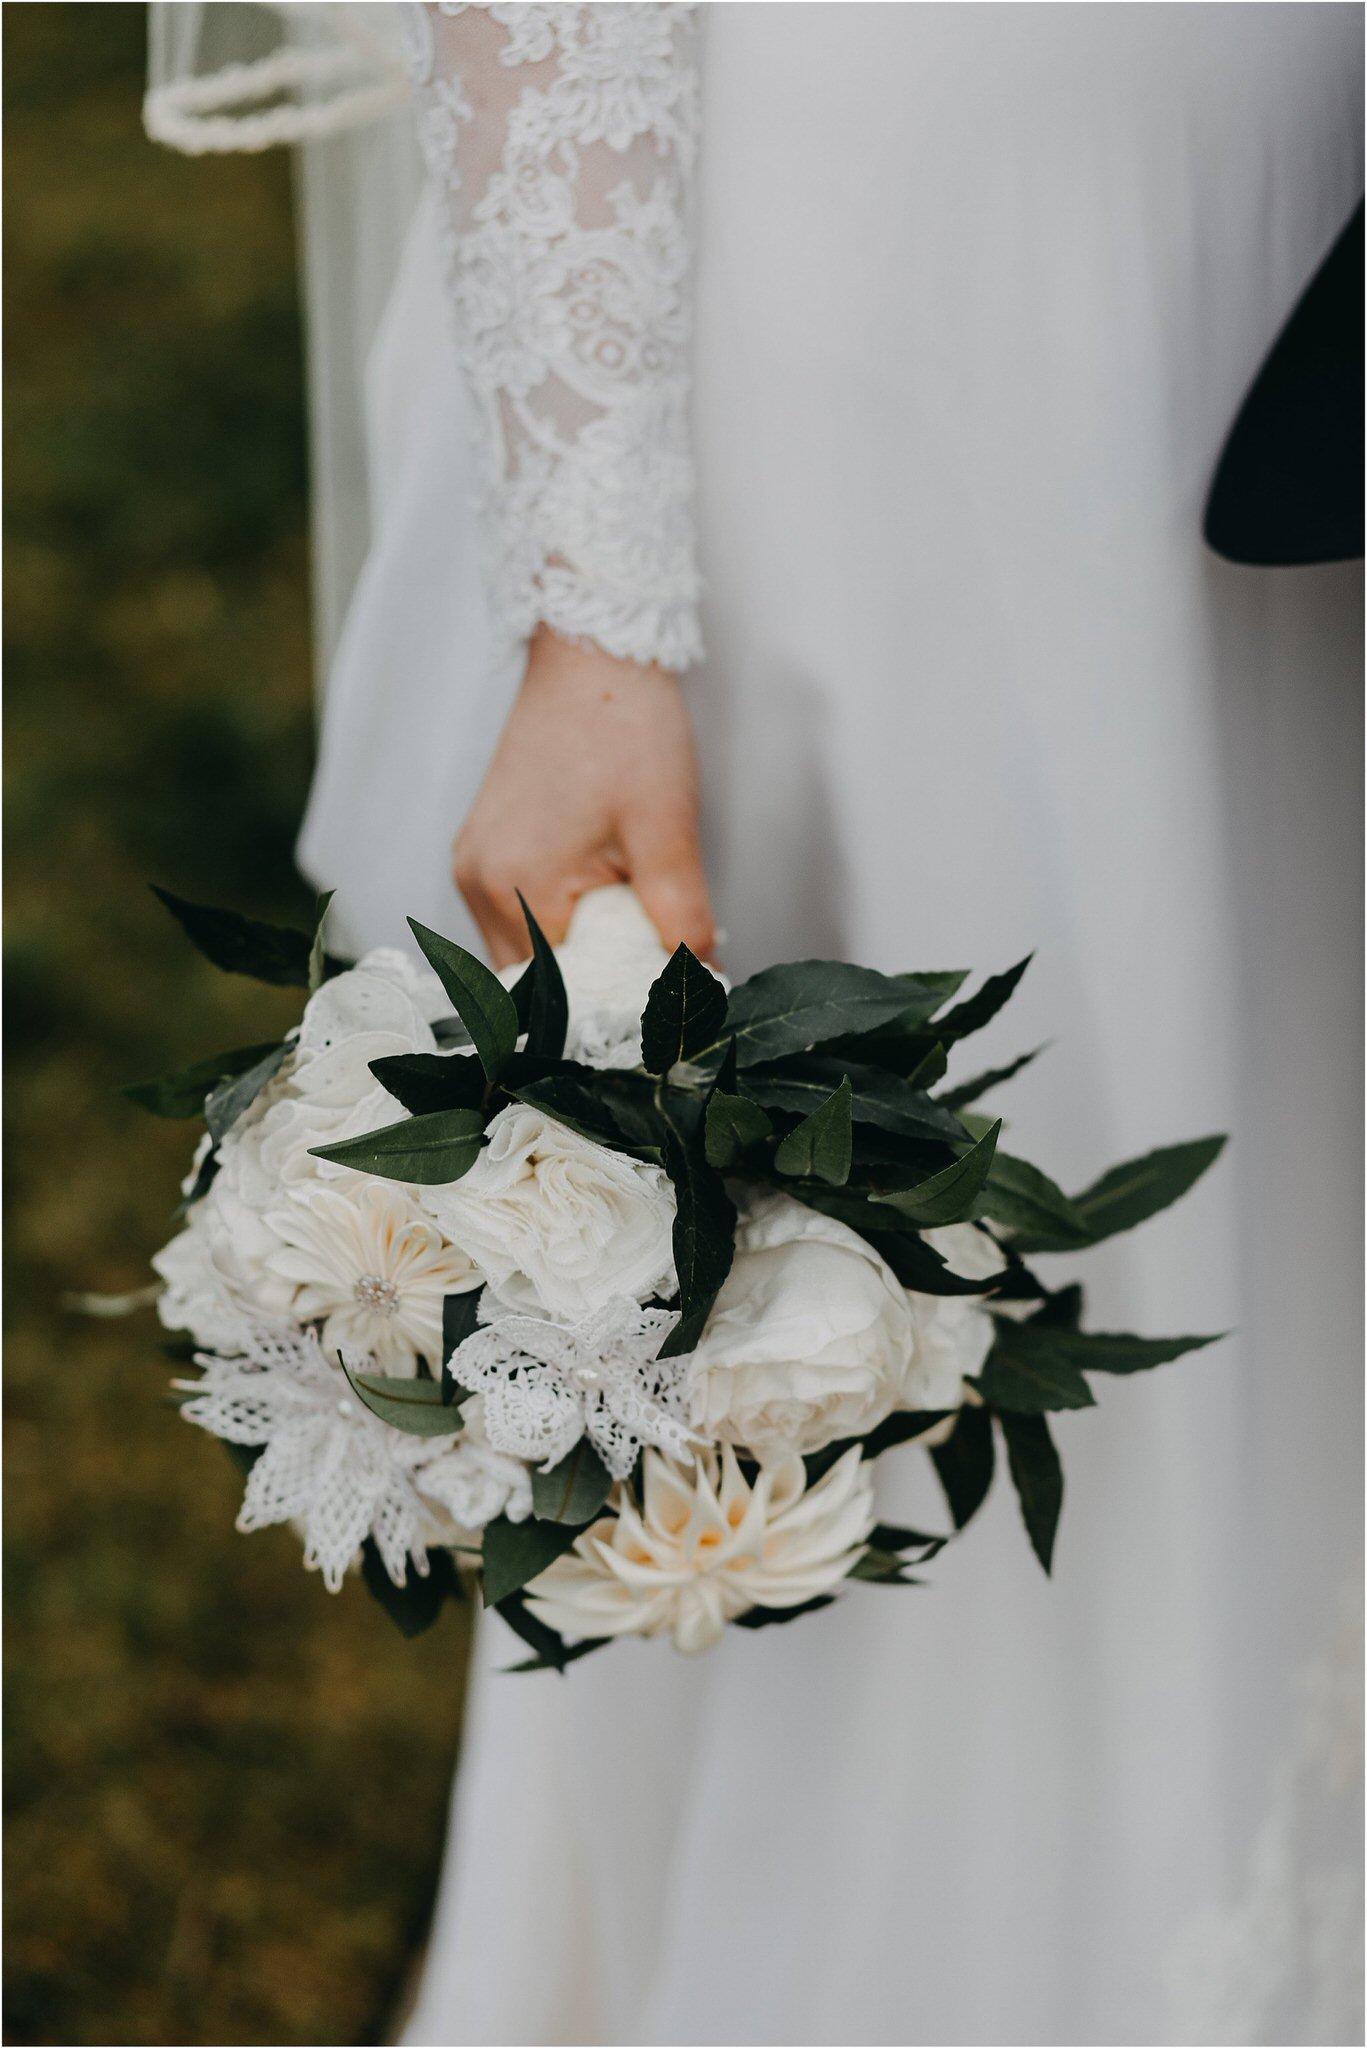 katy-robin-married-in-mukilteo-wedding24.jpg